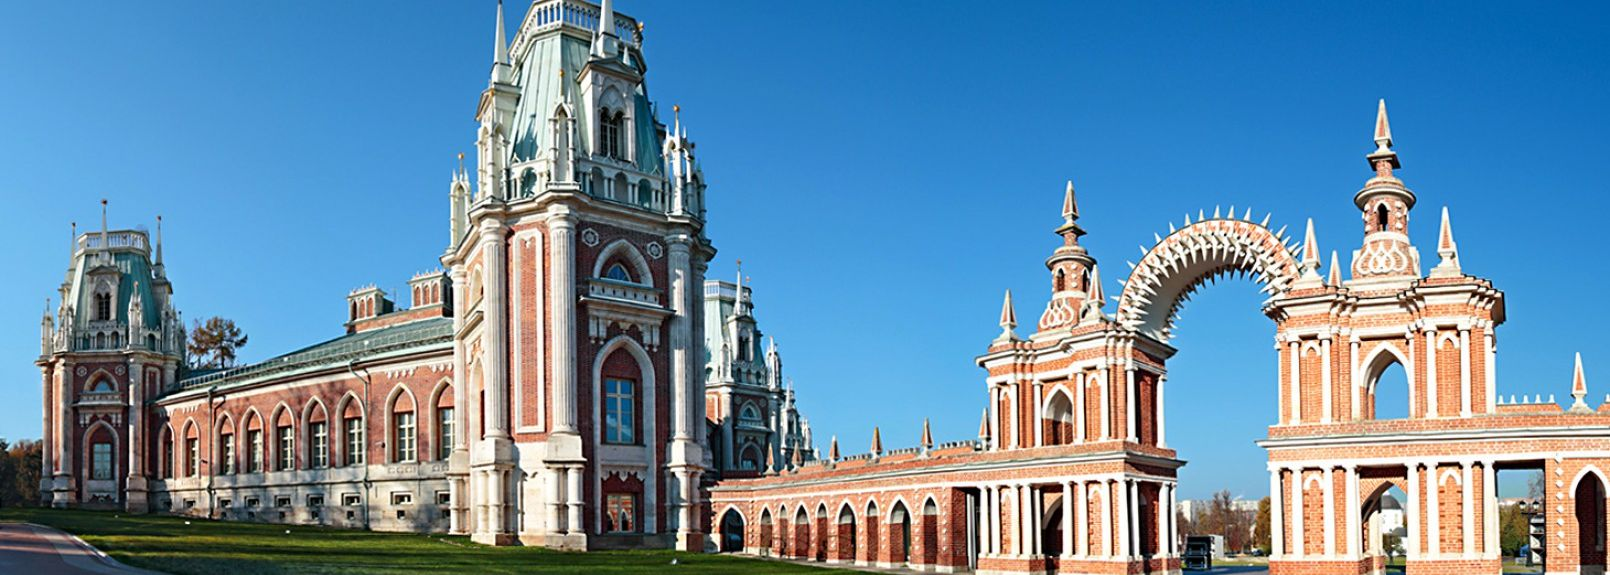 Widnoje, Oblast Moskau, Russland